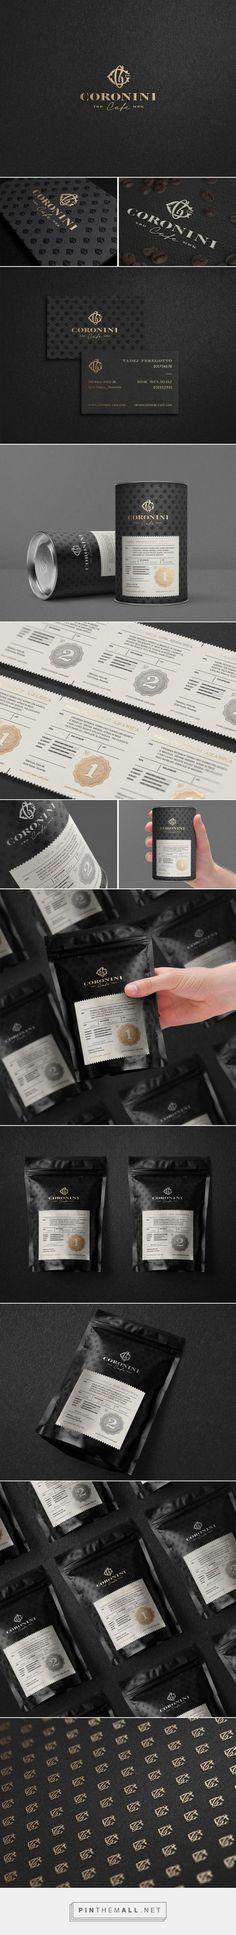 Coronini Cafe Coffee packaging designed by Milovanović (Slovenia) - http://www.packagingoftheworld.com/2016/02/coronini-cafe.html: